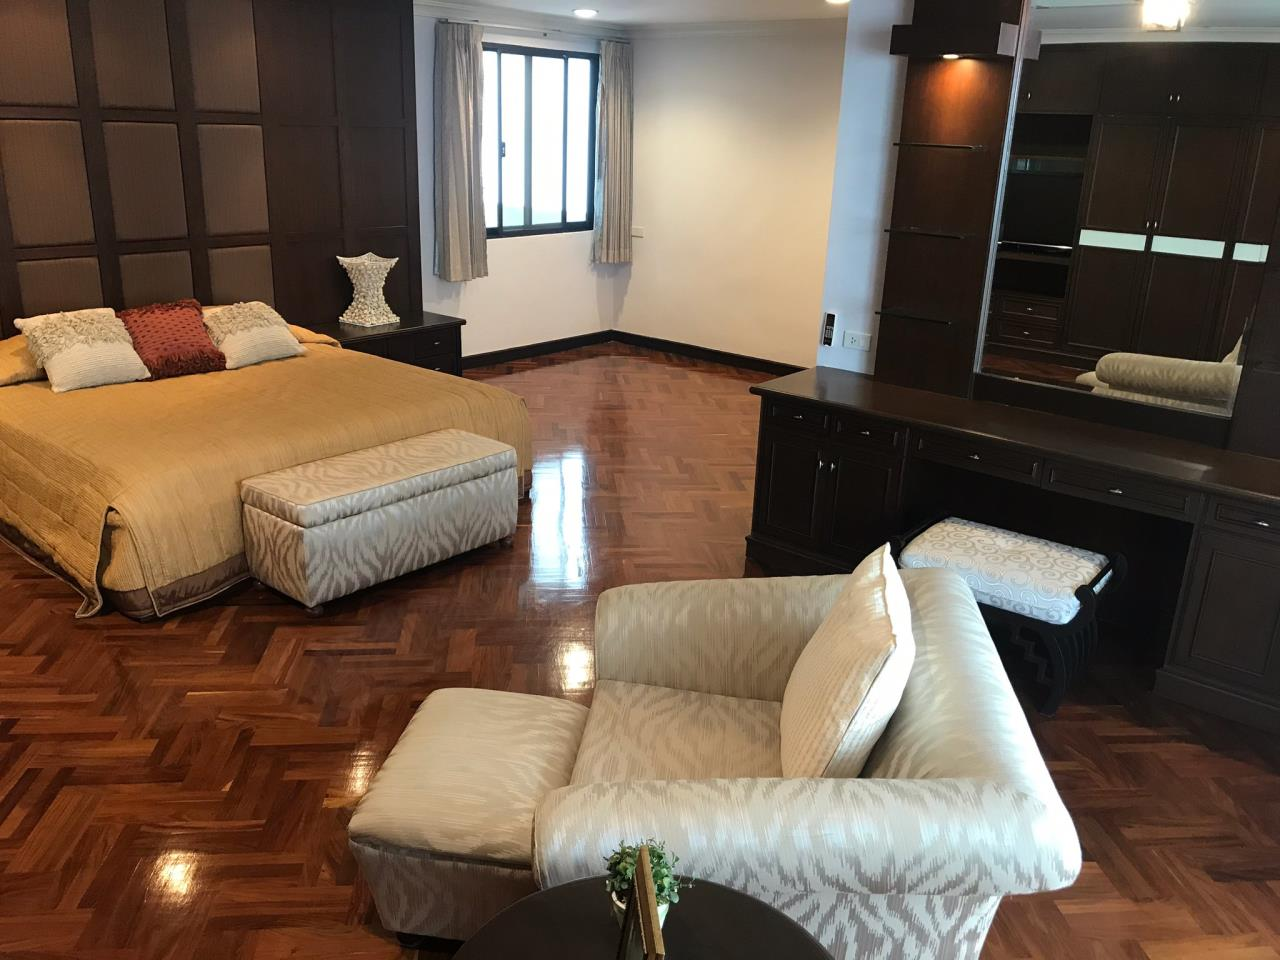 Blueocean property Agency's Condo For Rent – Hawaiii Tower 16